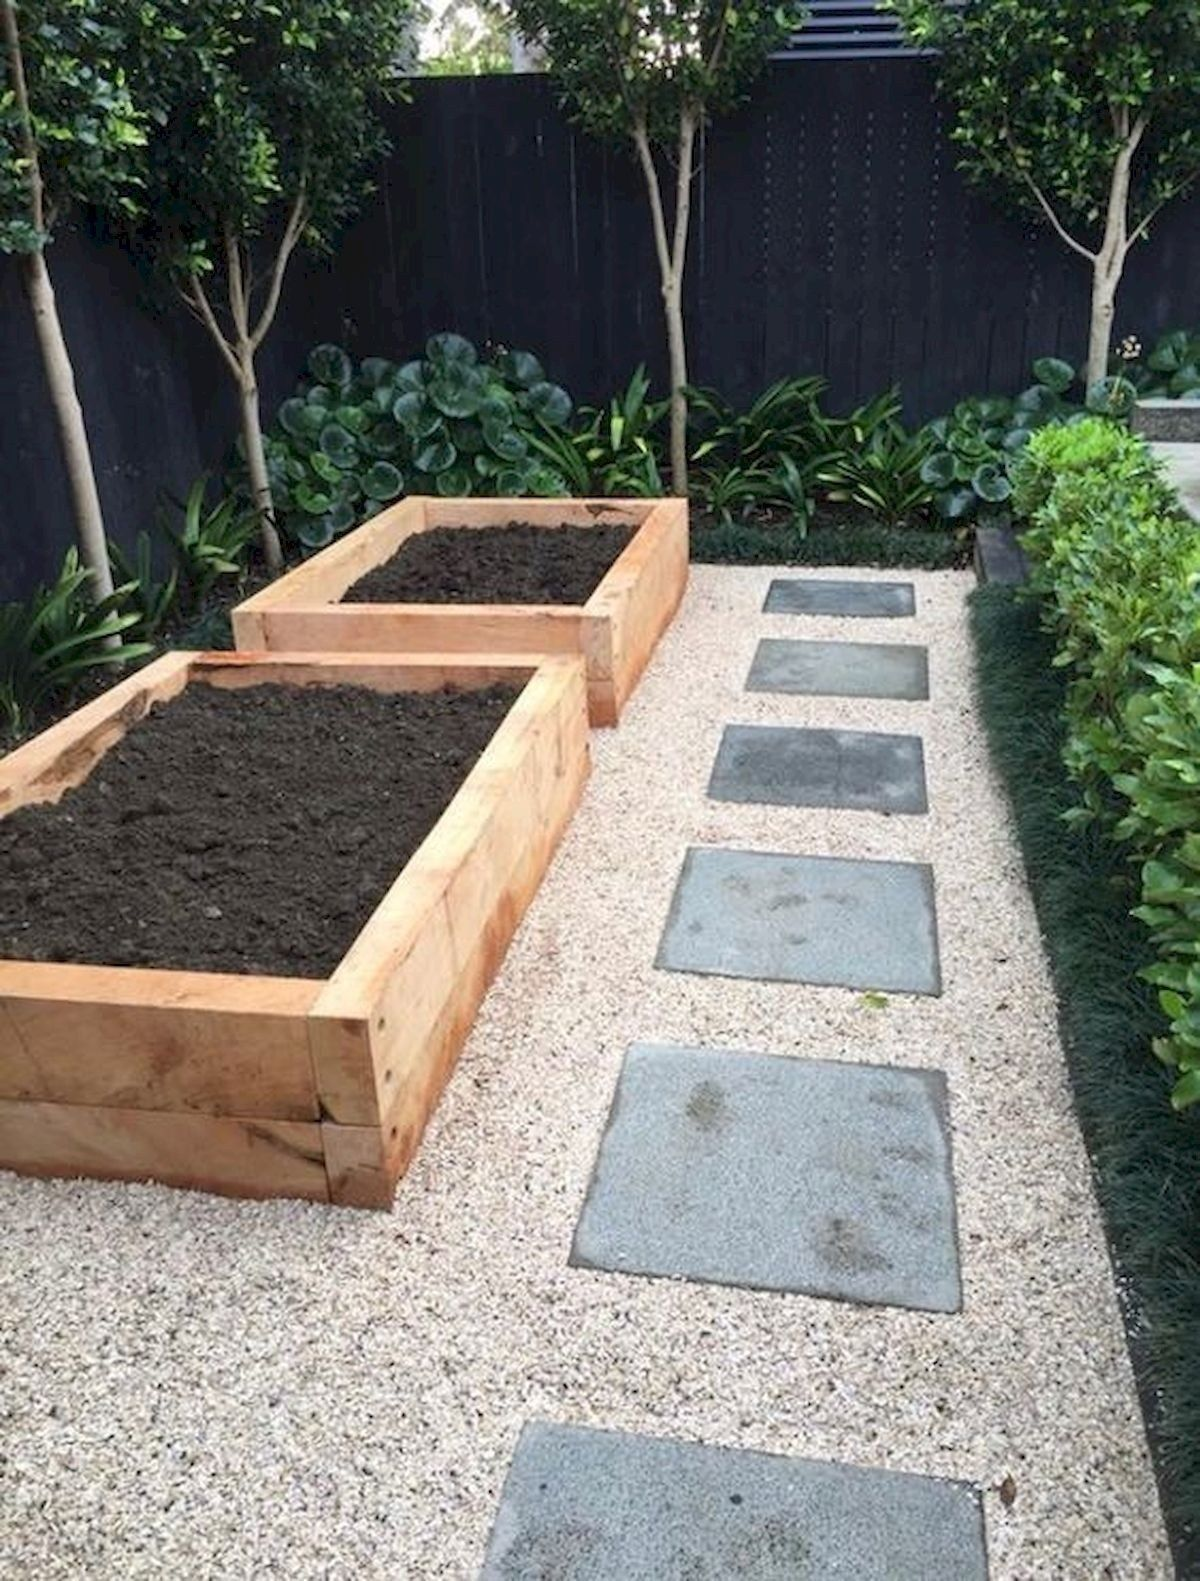 Photo of garden boxes raised